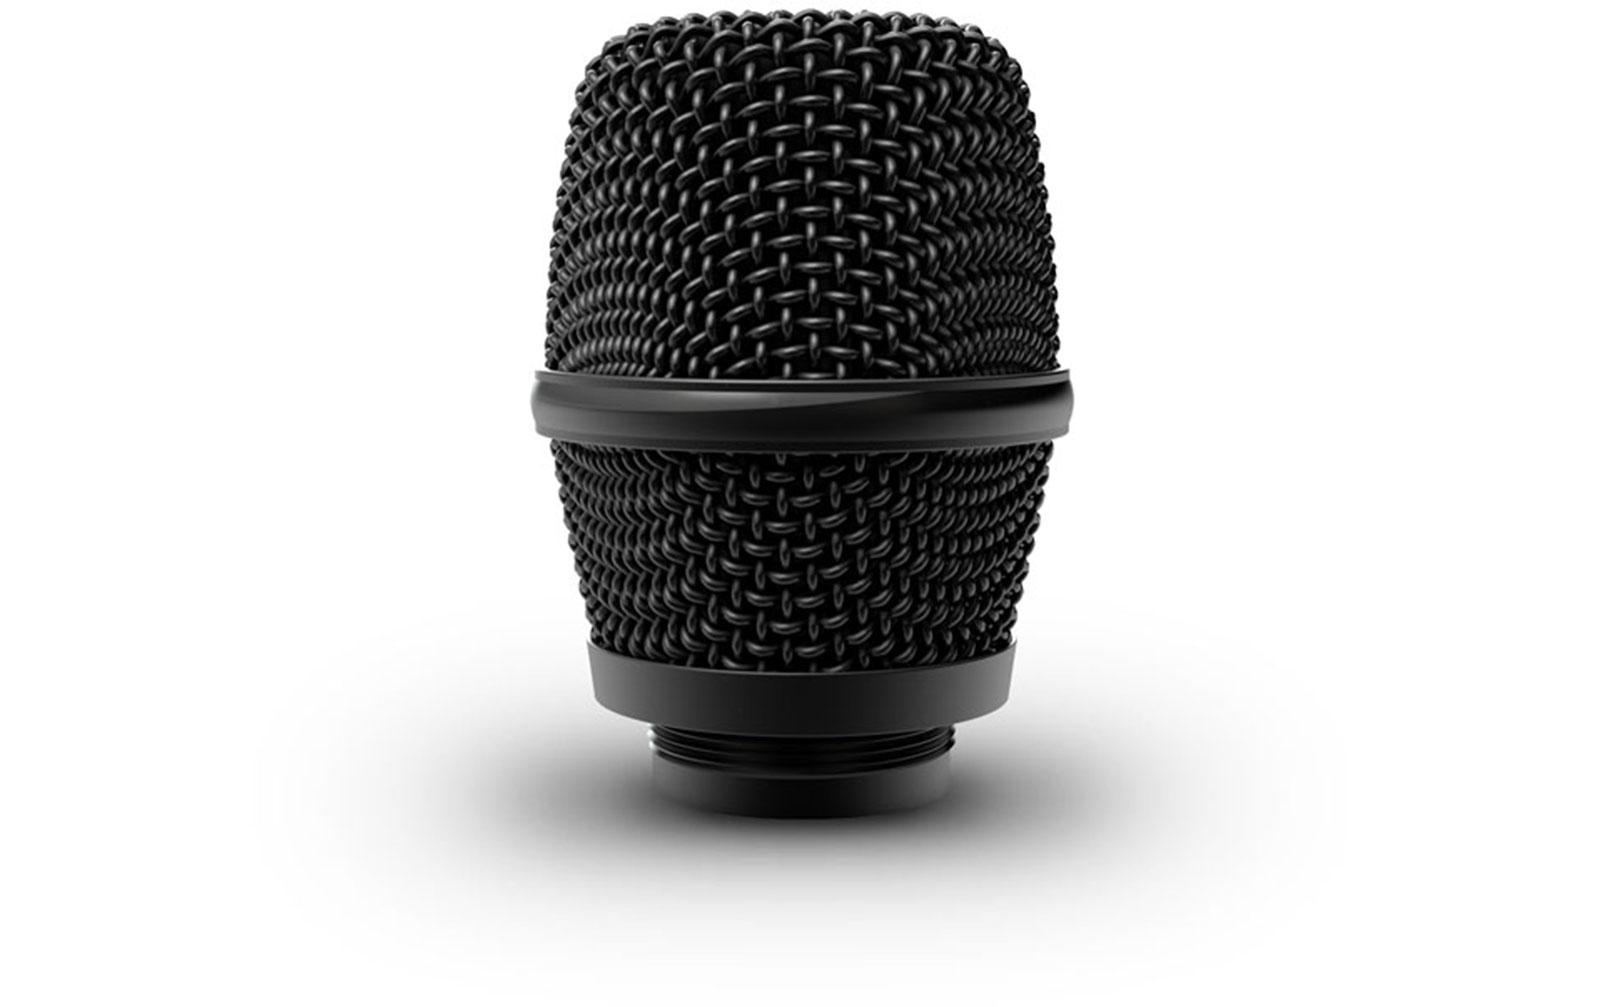 ld-systems-u500-ch-kondensator-mikrofonkopf-mit-hypernieren-charakteristik, 49.00 EUR @ music-and-more-store